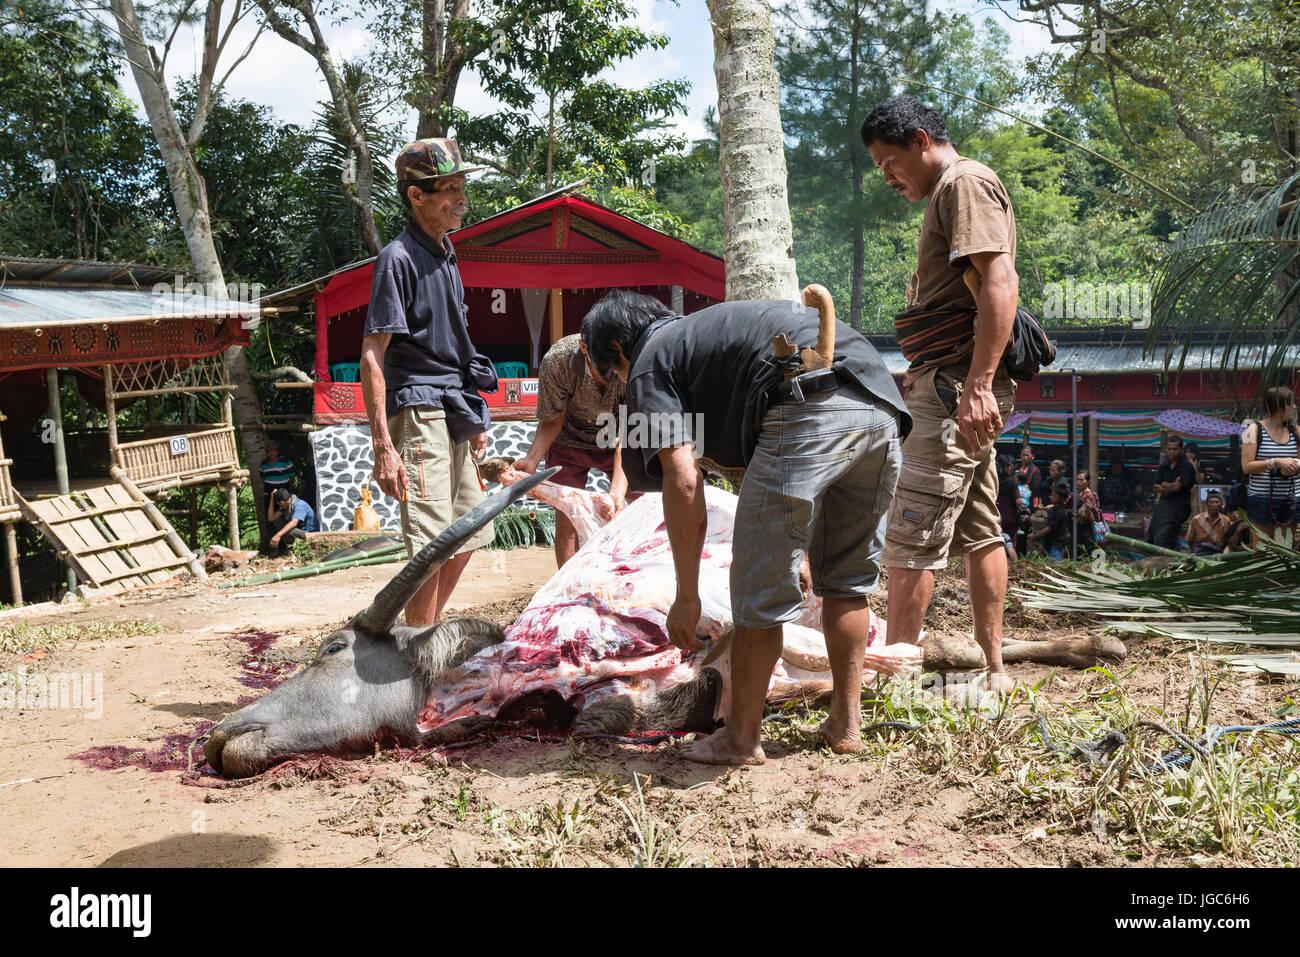 Water buffalo sacrificed for the funeral celebration of an old man, Tana Toraja, Sulawesi, Indonesia - Stock Image